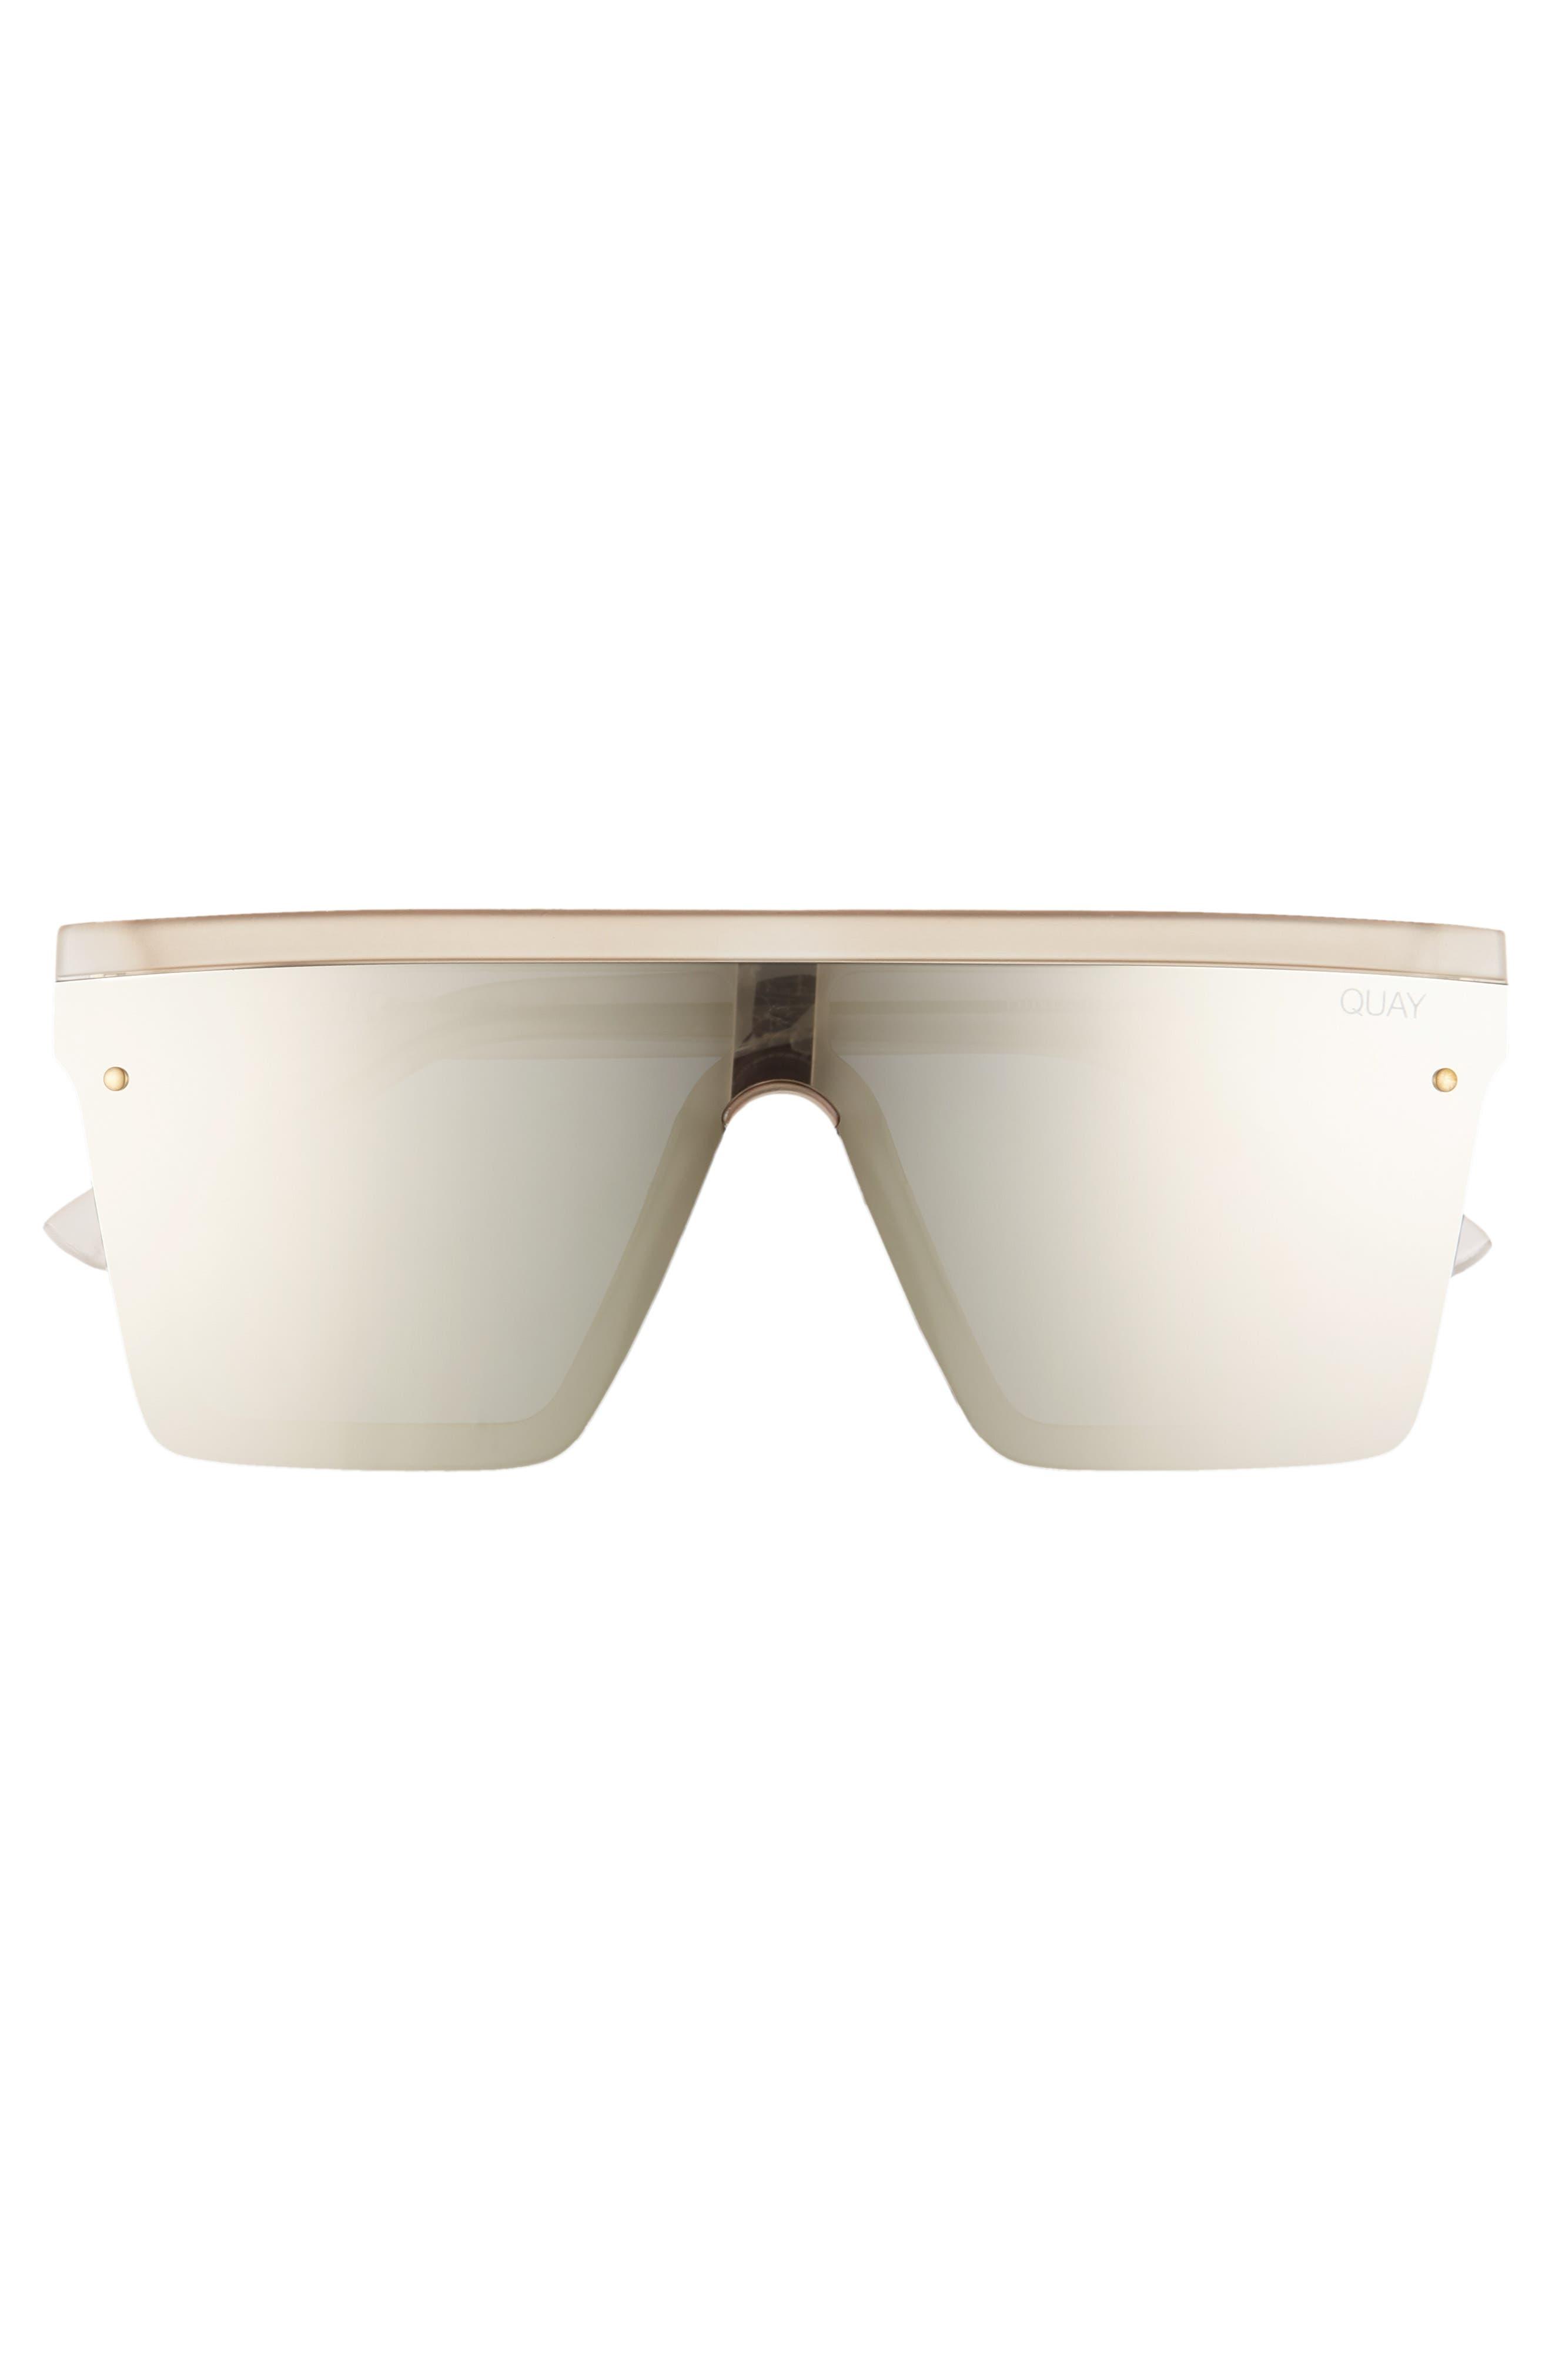 Hindsight 150mm Shield Sunglasses,                             Alternate thumbnail 3, color,                             GOLD/ GOLD